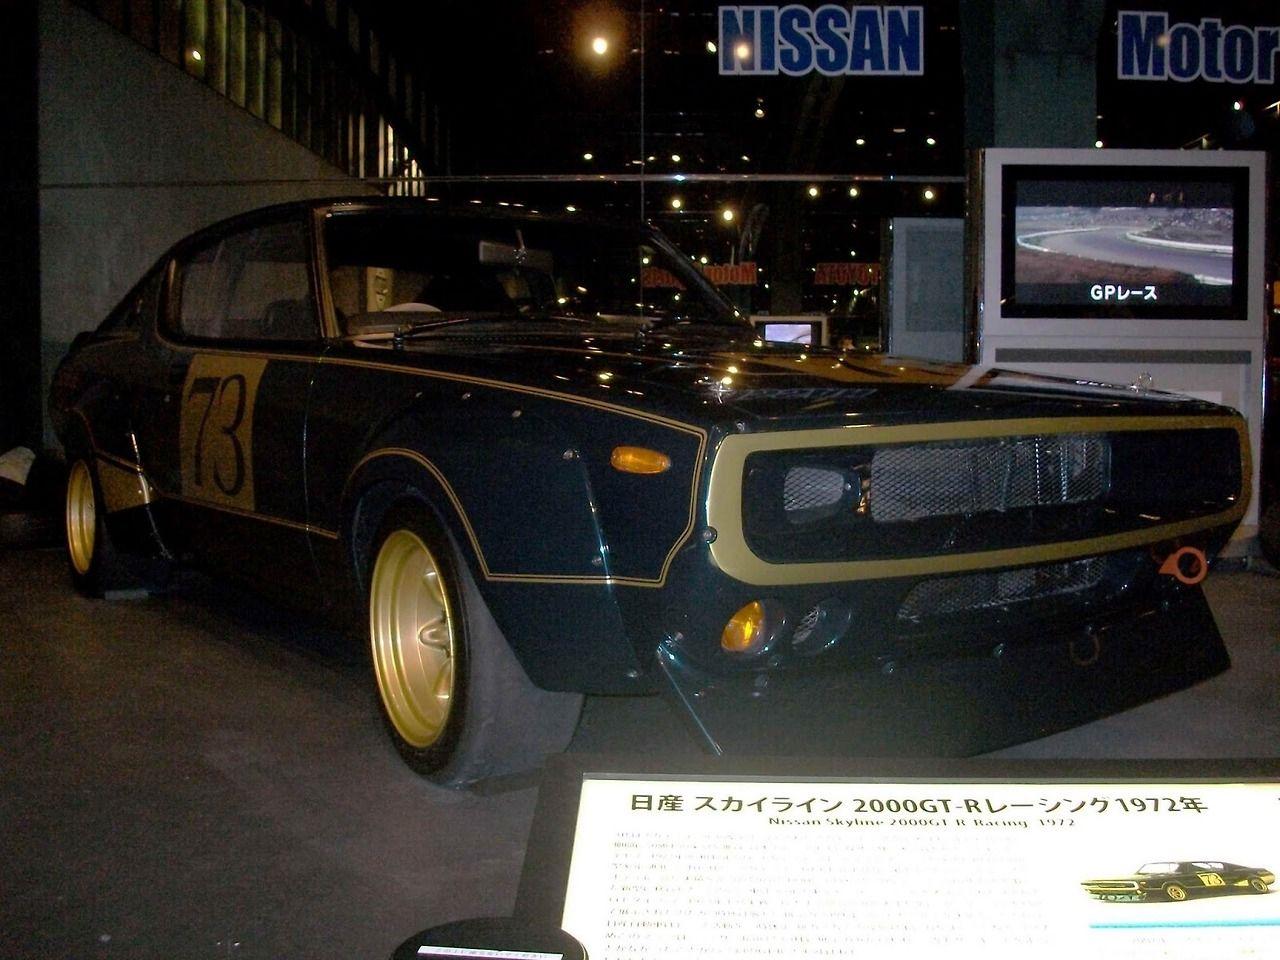 1972 nissan skyline 2000gt r race car kenmeri full works 1972 nissan skyline 2000gt r race car vanachro Gallery